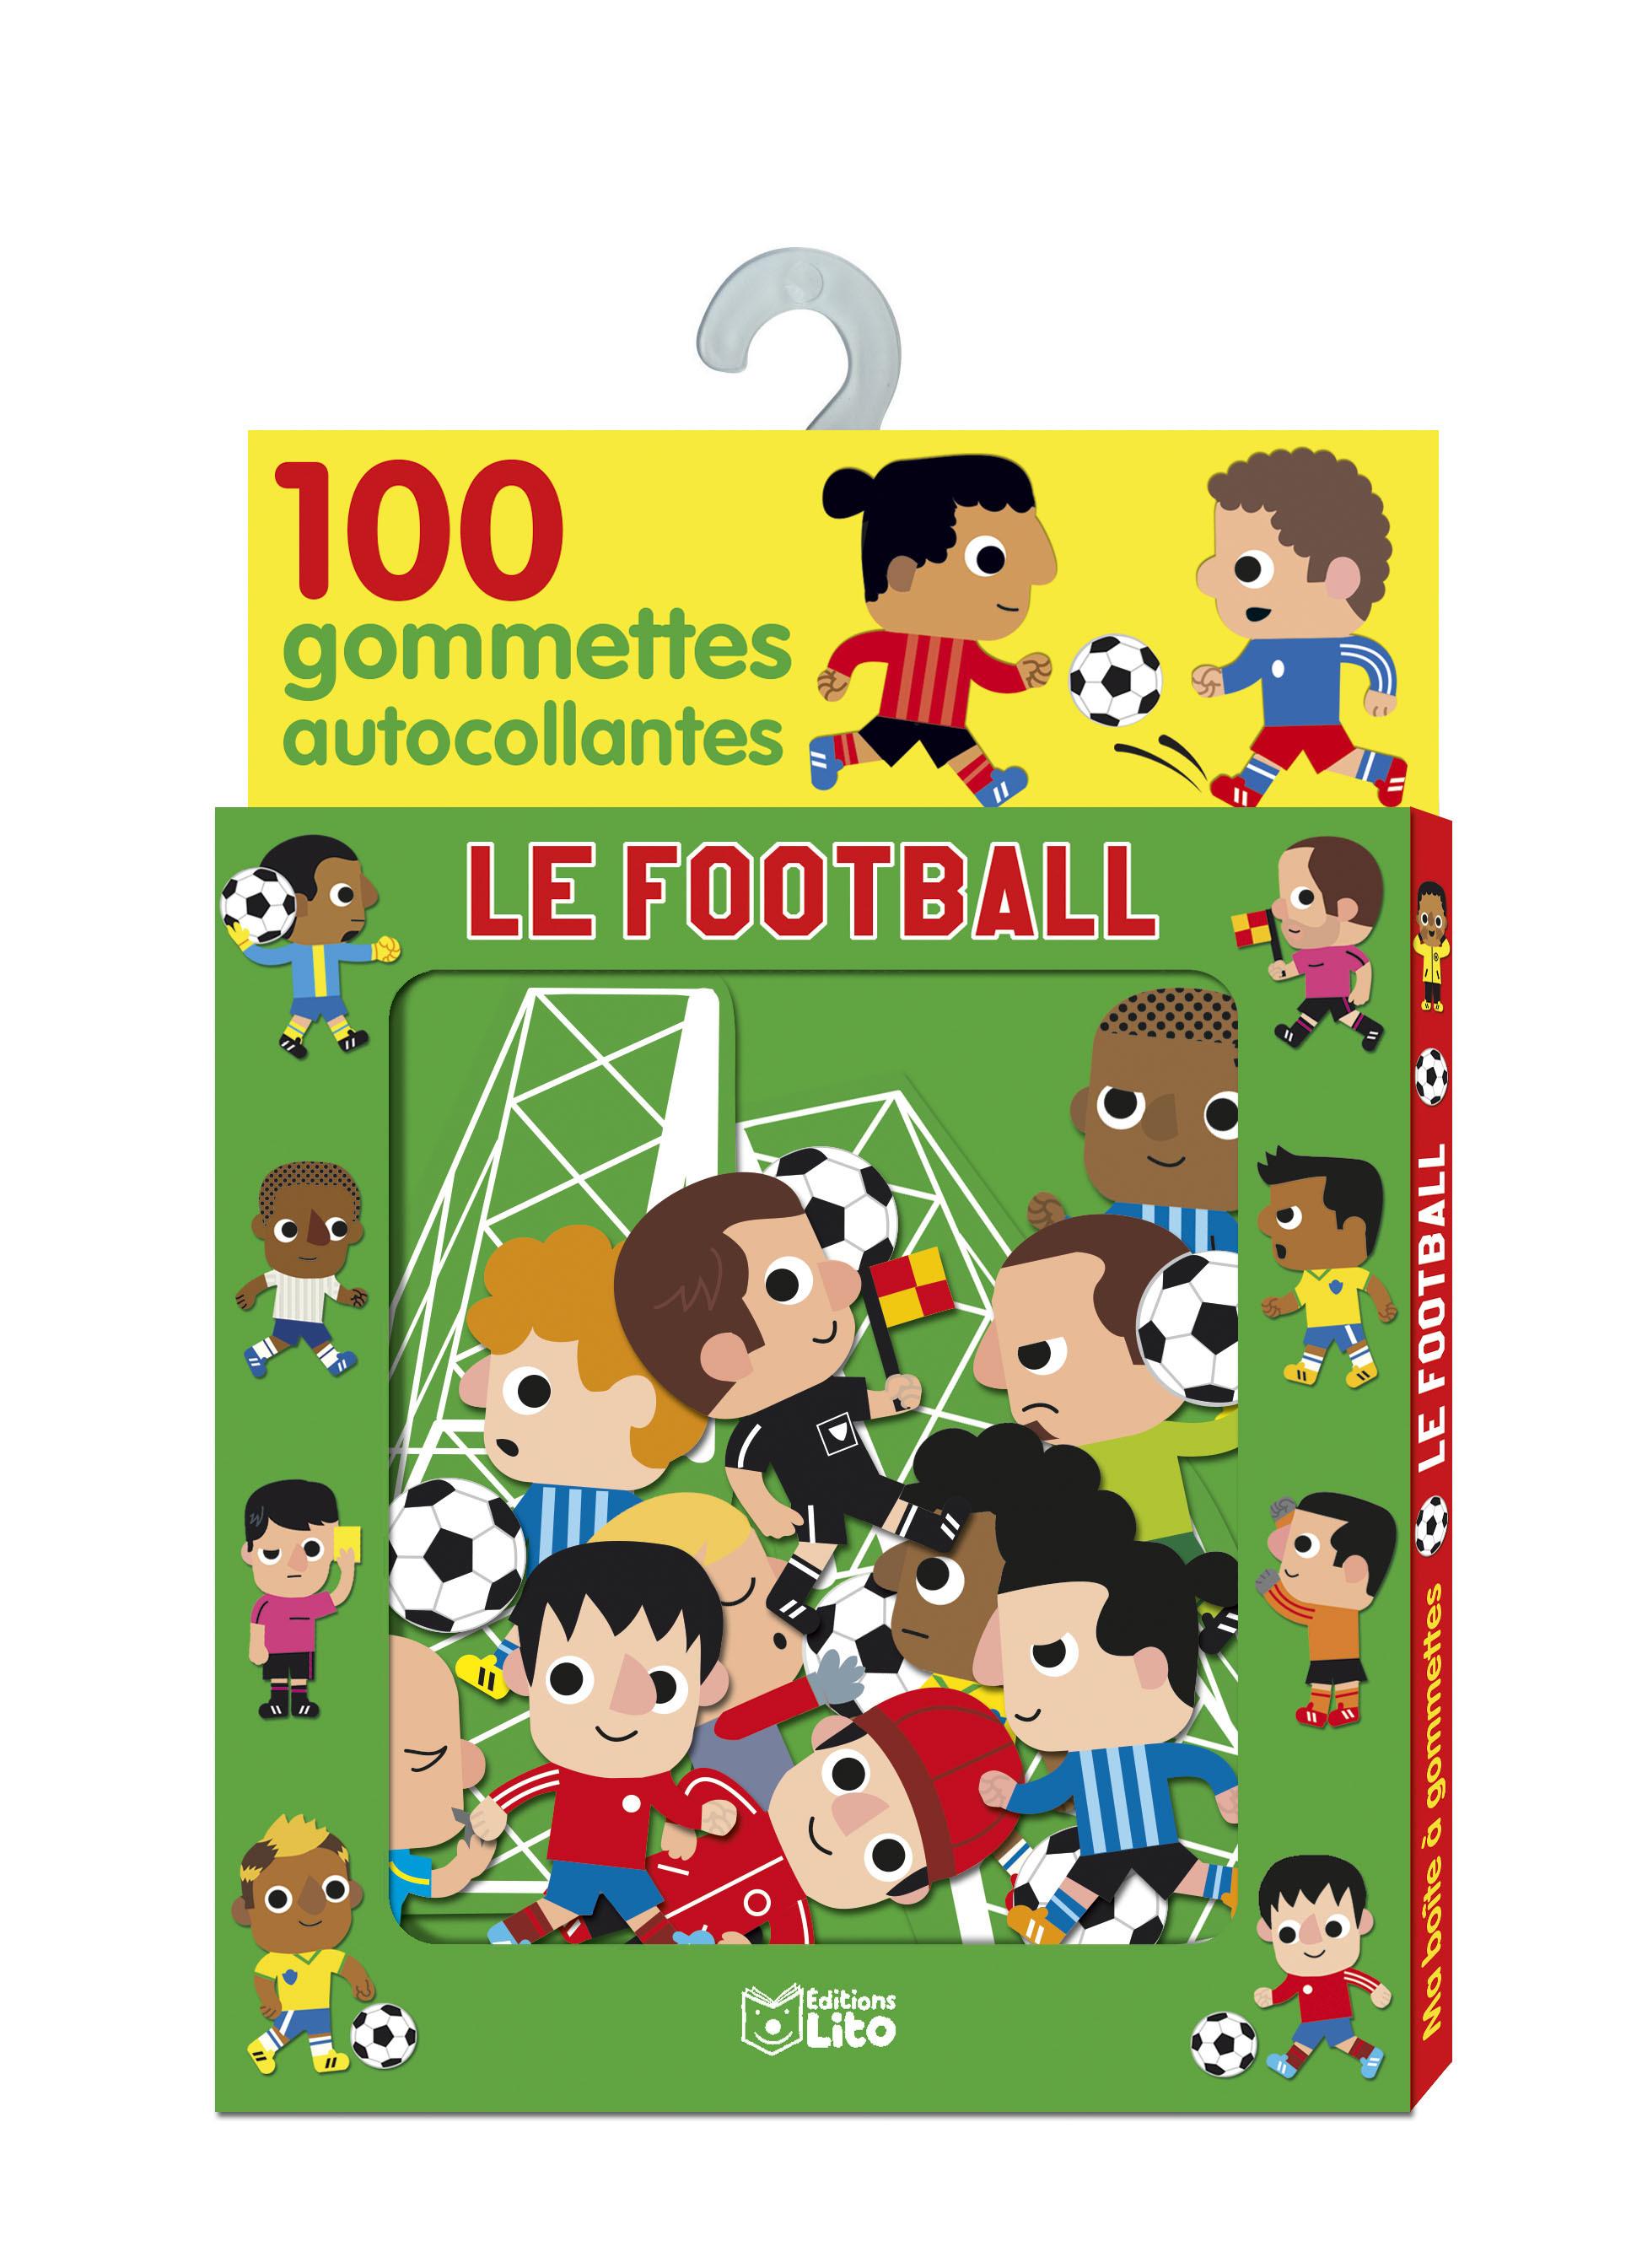 GOMMETTES LE FOOTBALL